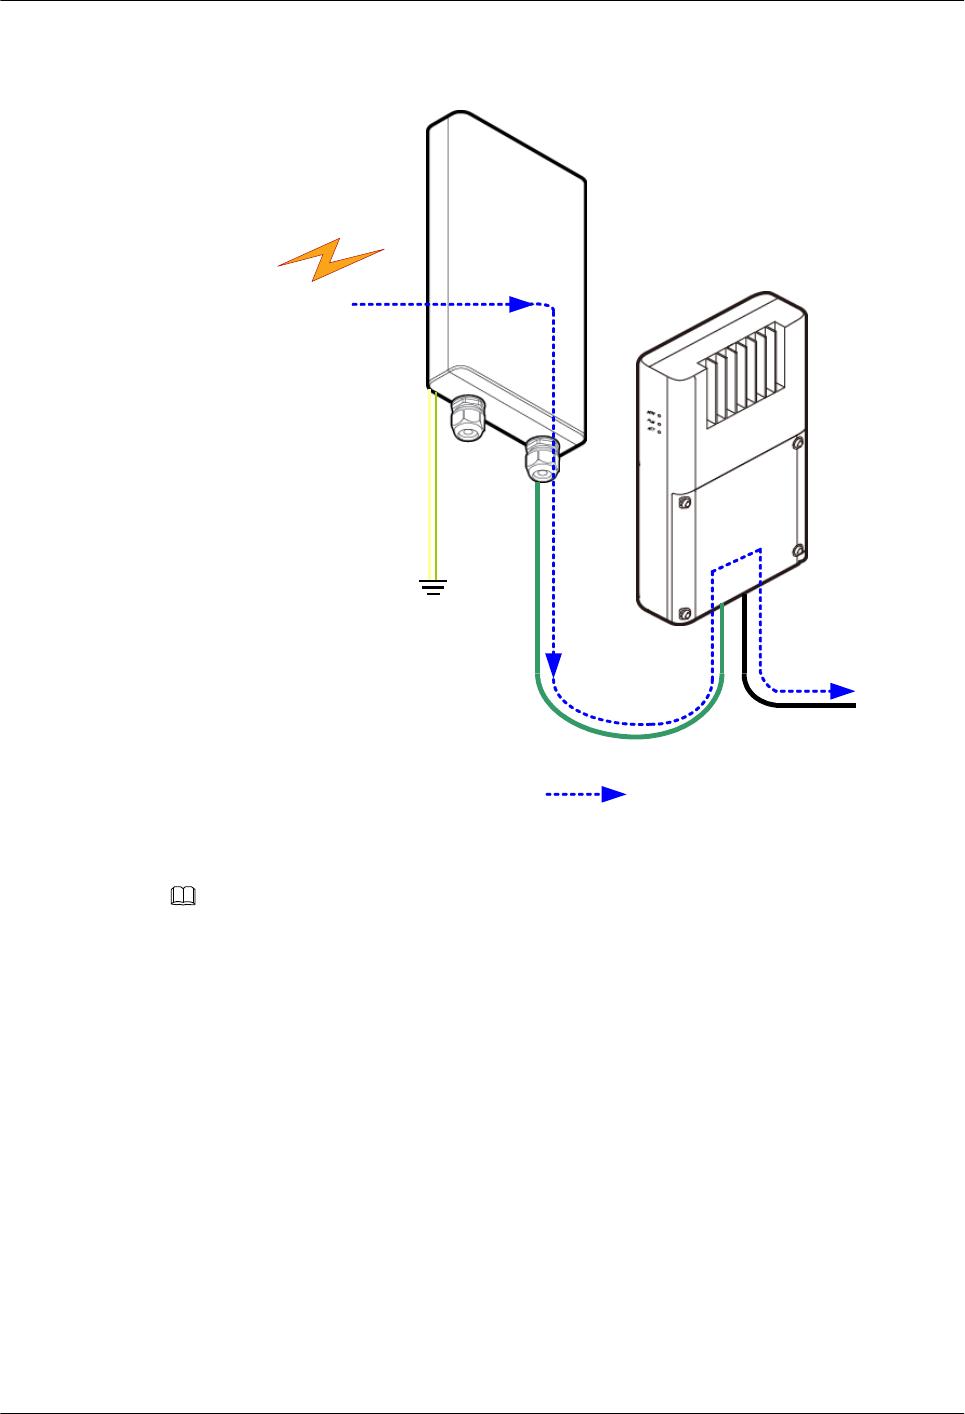 Huawei Technologies RTN360R6 Radio Transmission System